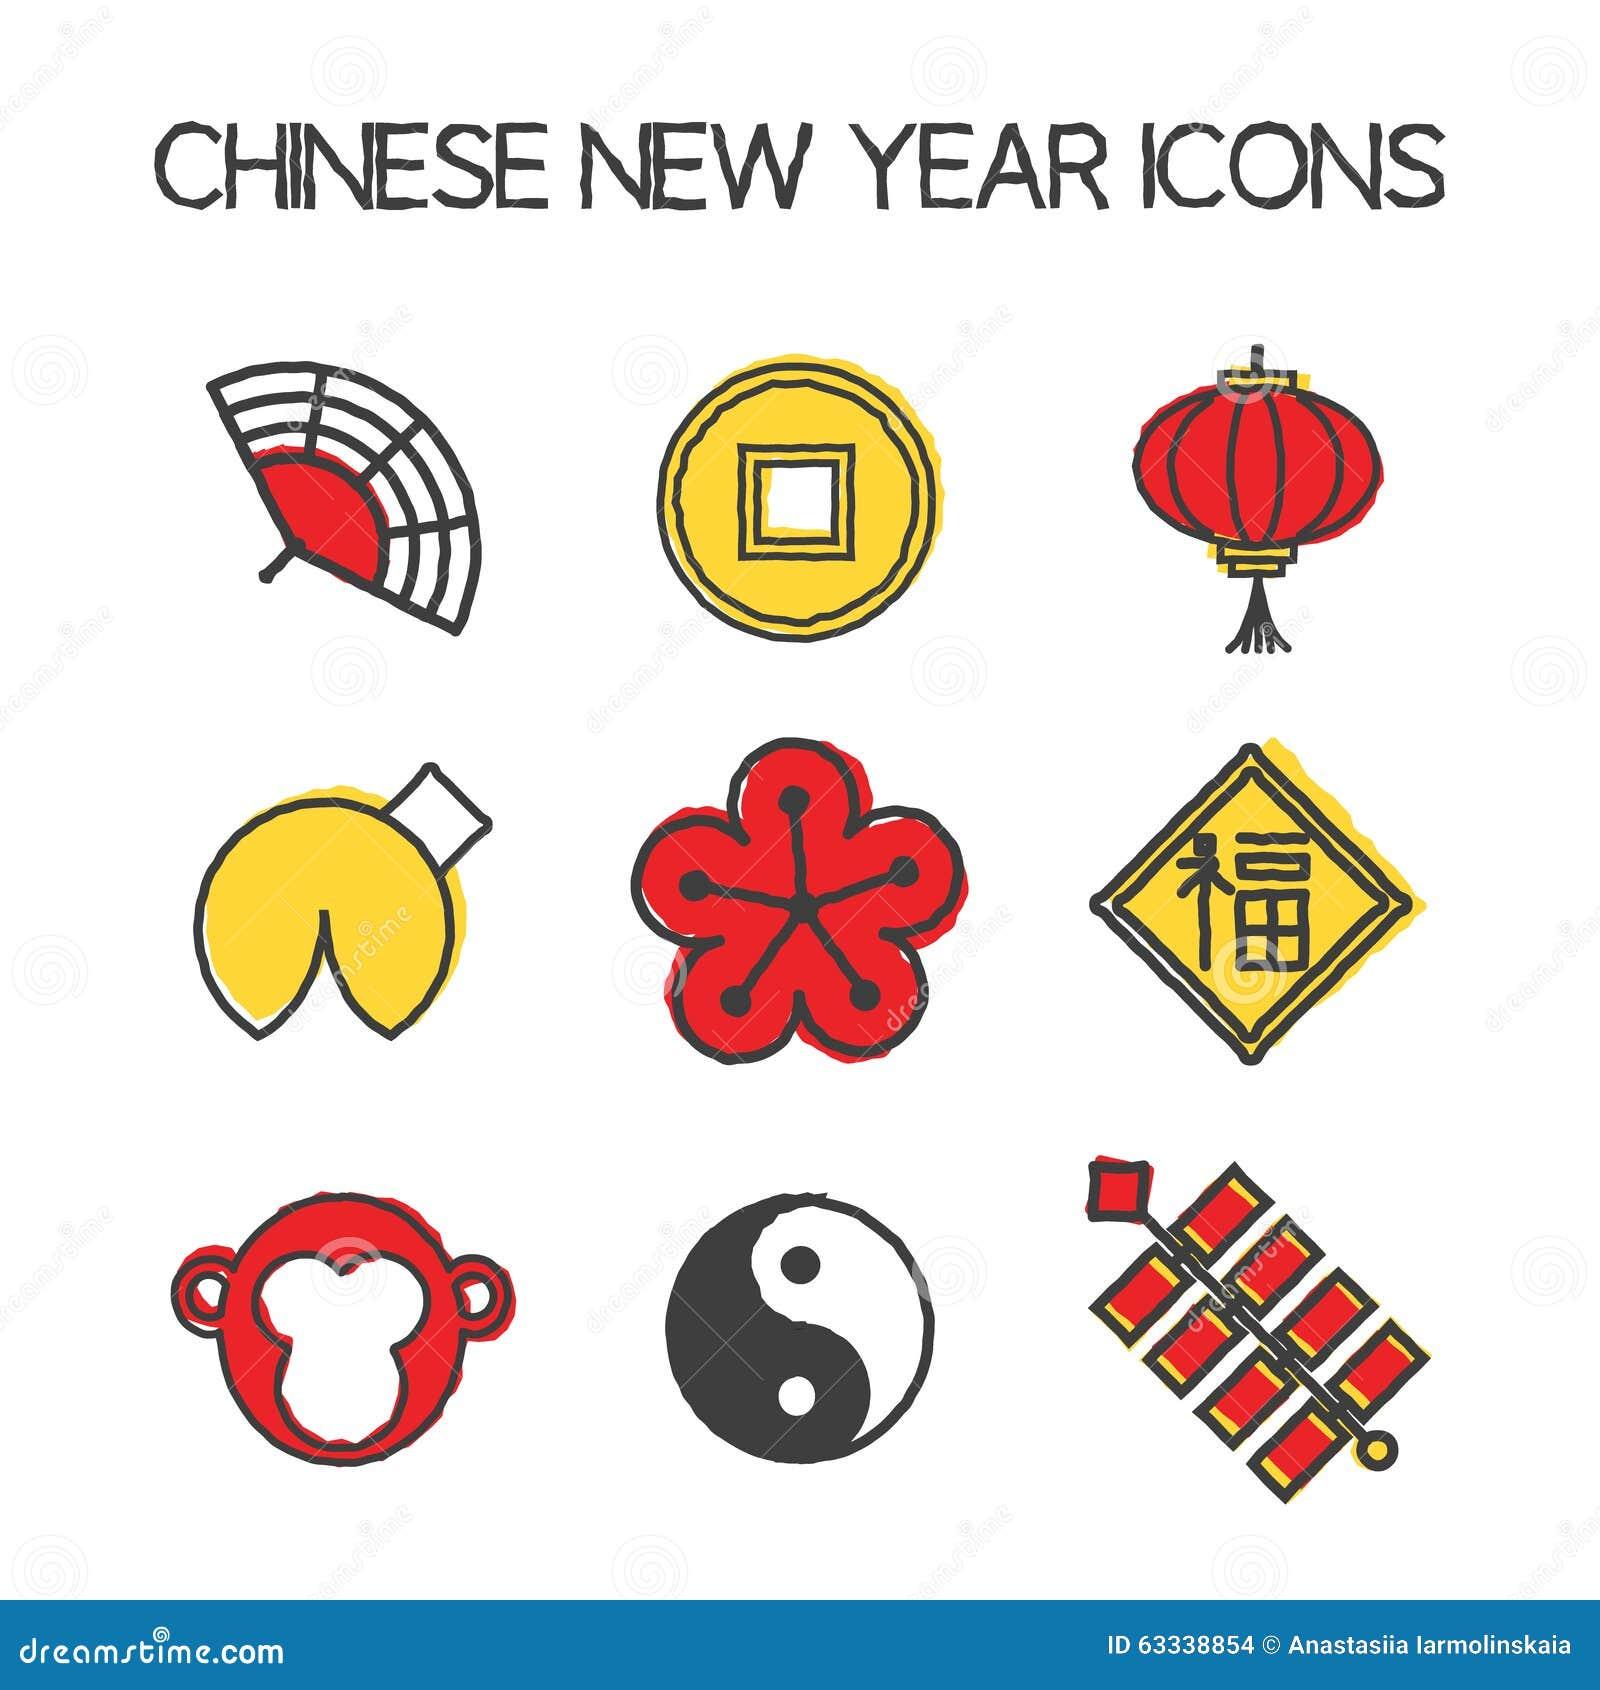 Year Of The Monkey Icons. Stock Illustration - Image: 63338854  How